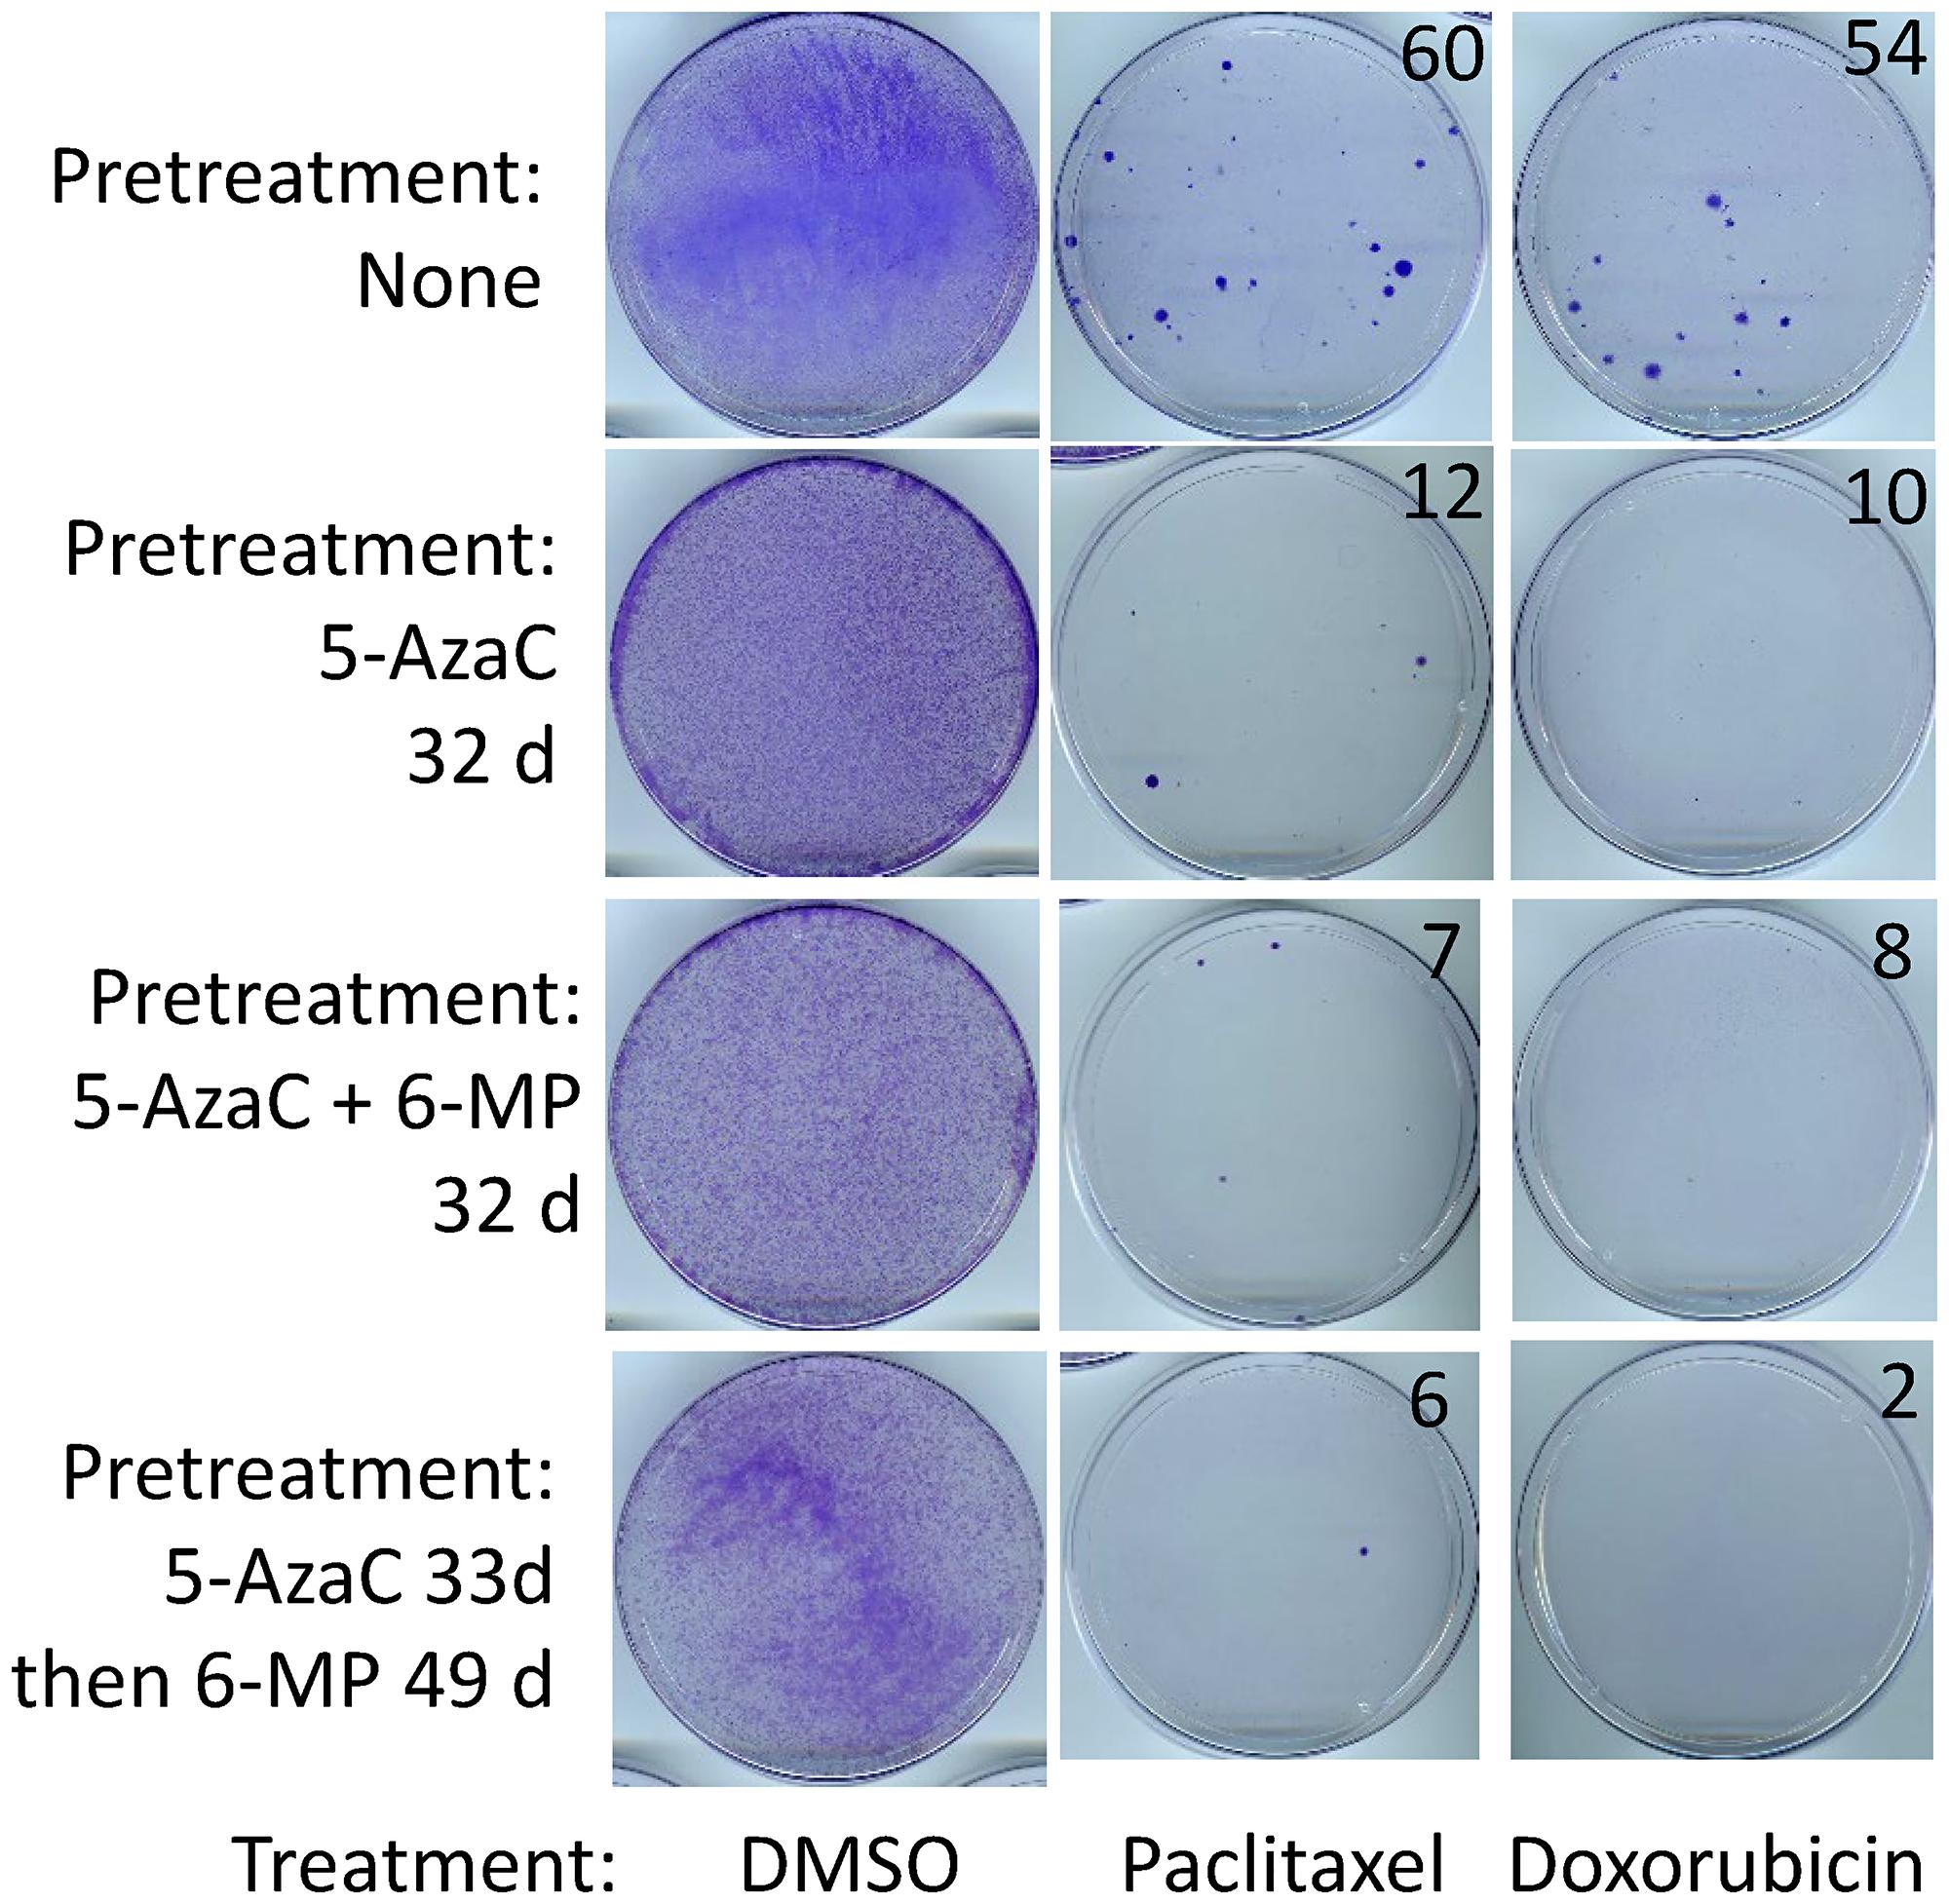 SUM149 cells surviving 5-AzaC/6-MP treatments are sensitive to cytotoxic drugs.